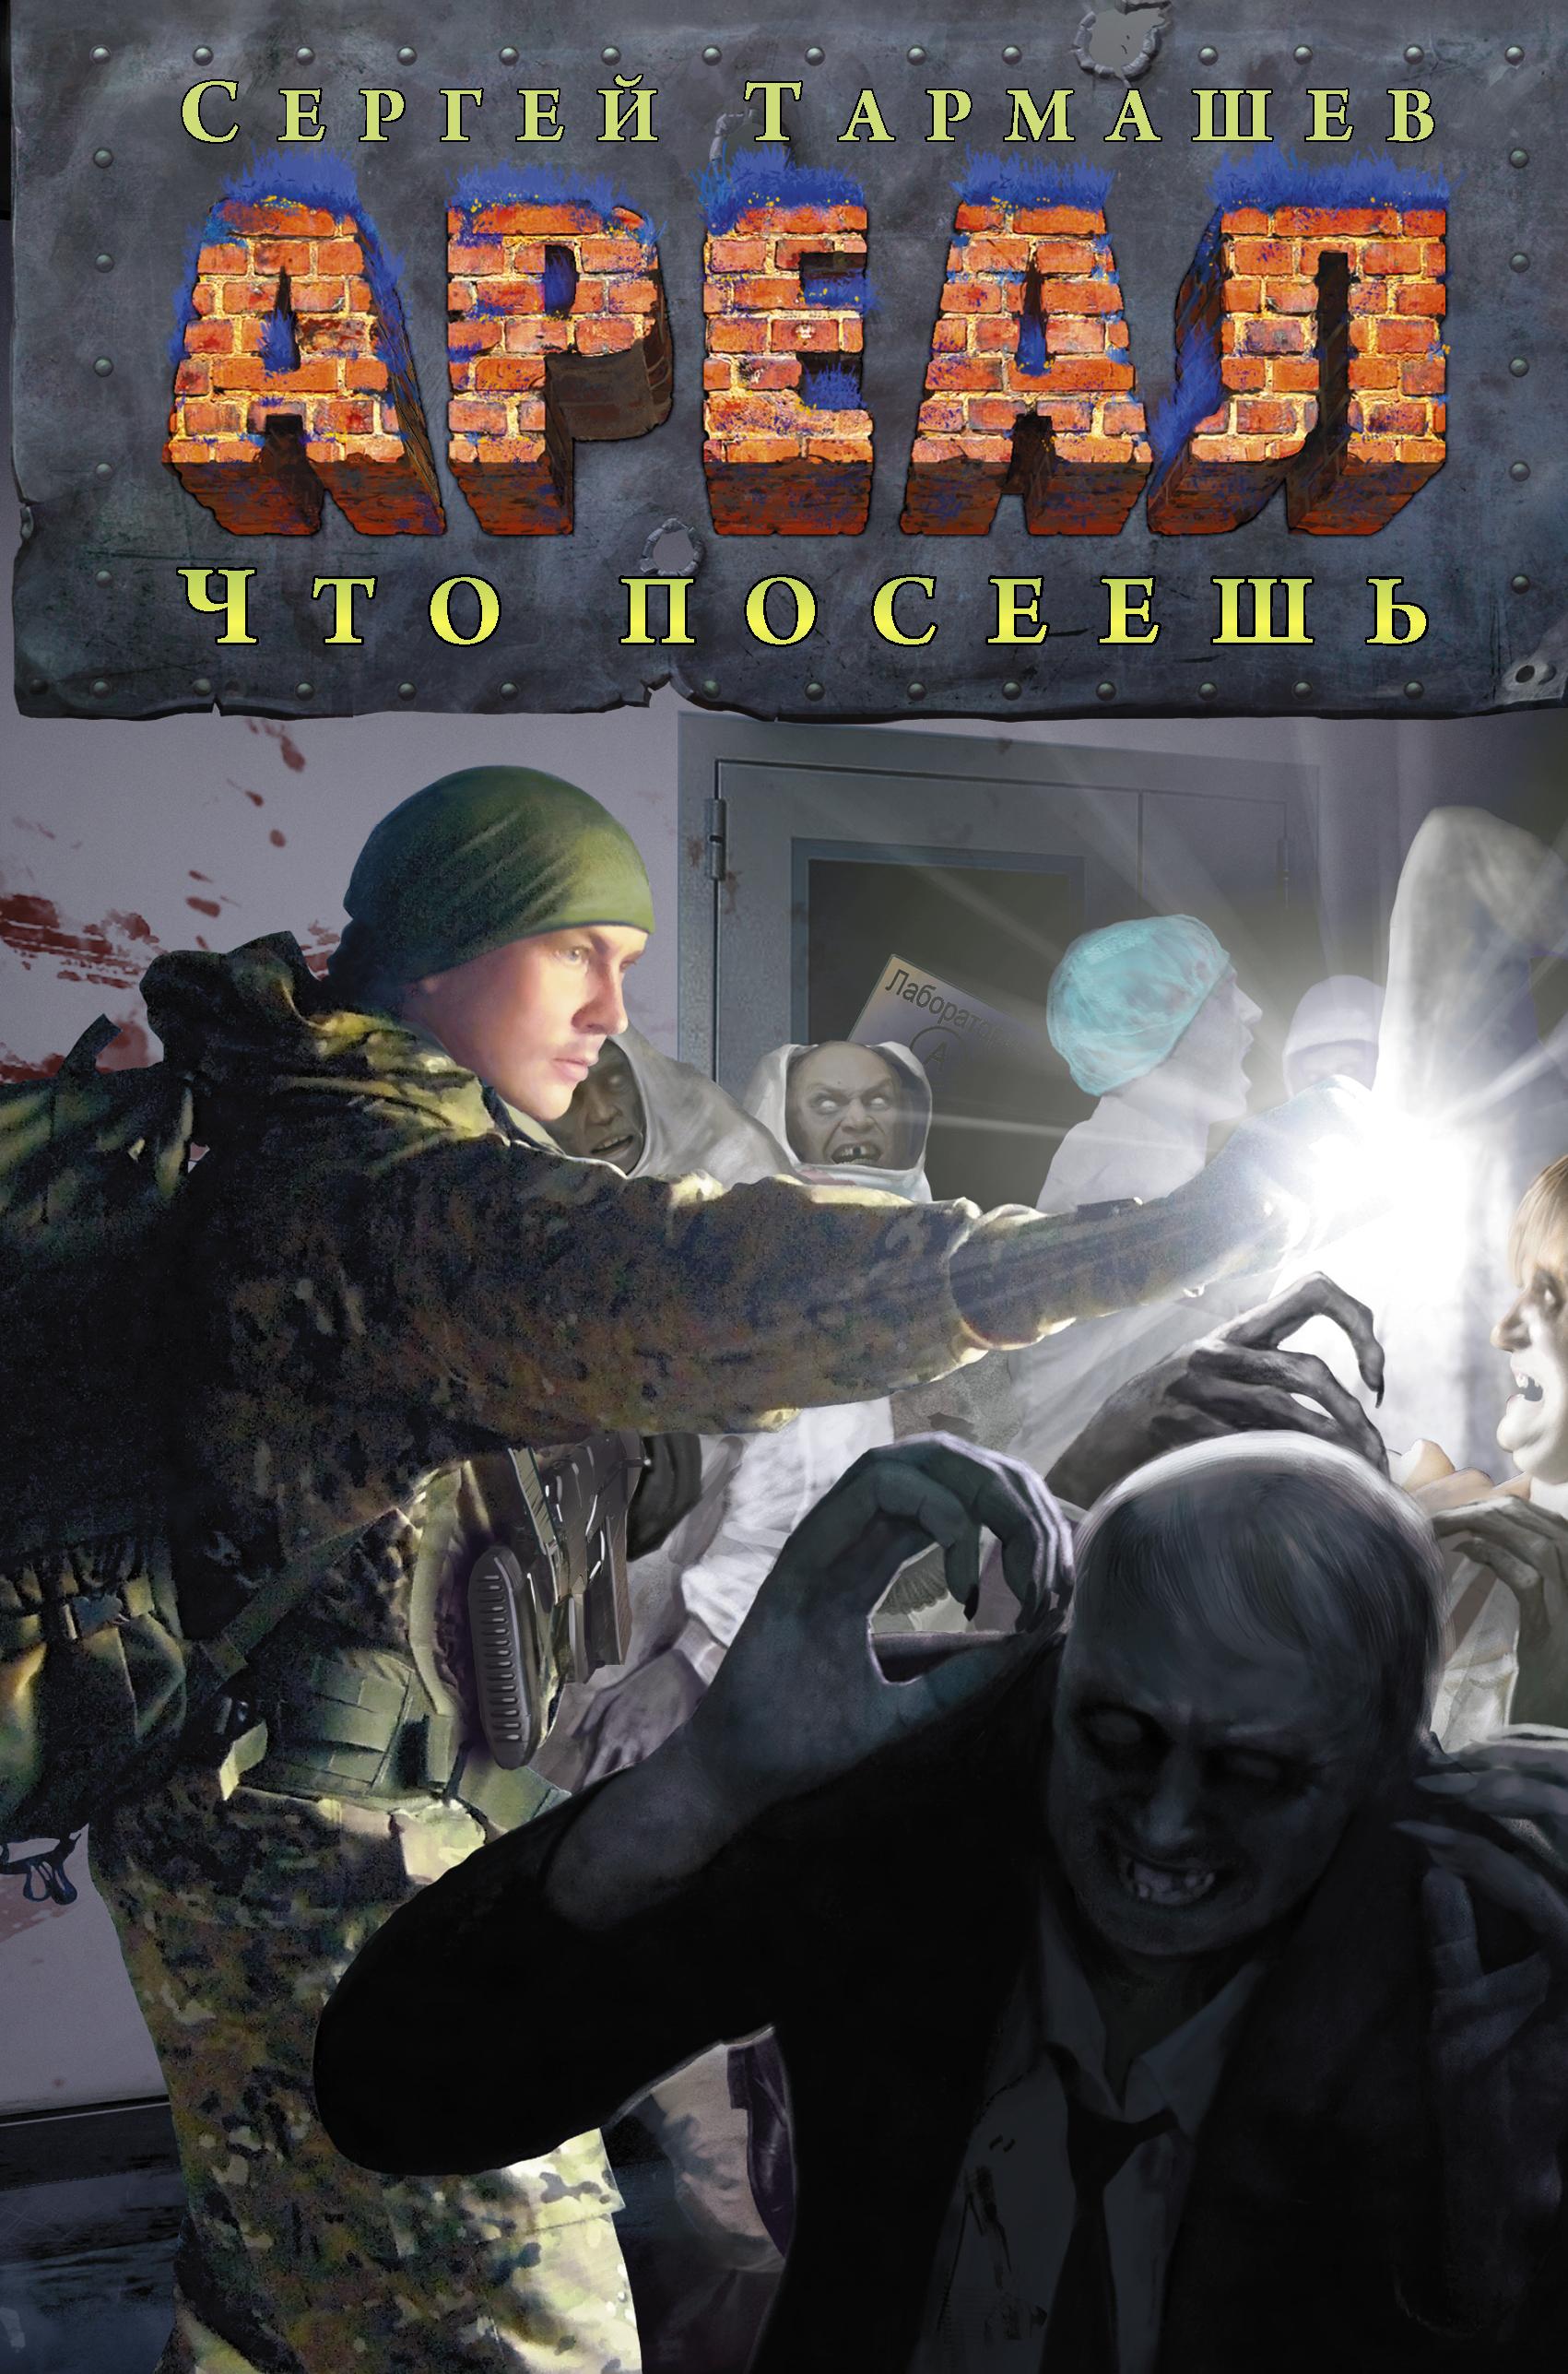 Сергей Тармашев Ареал. Что посеешь тармашев сергей сергеевич ареал что посеешь